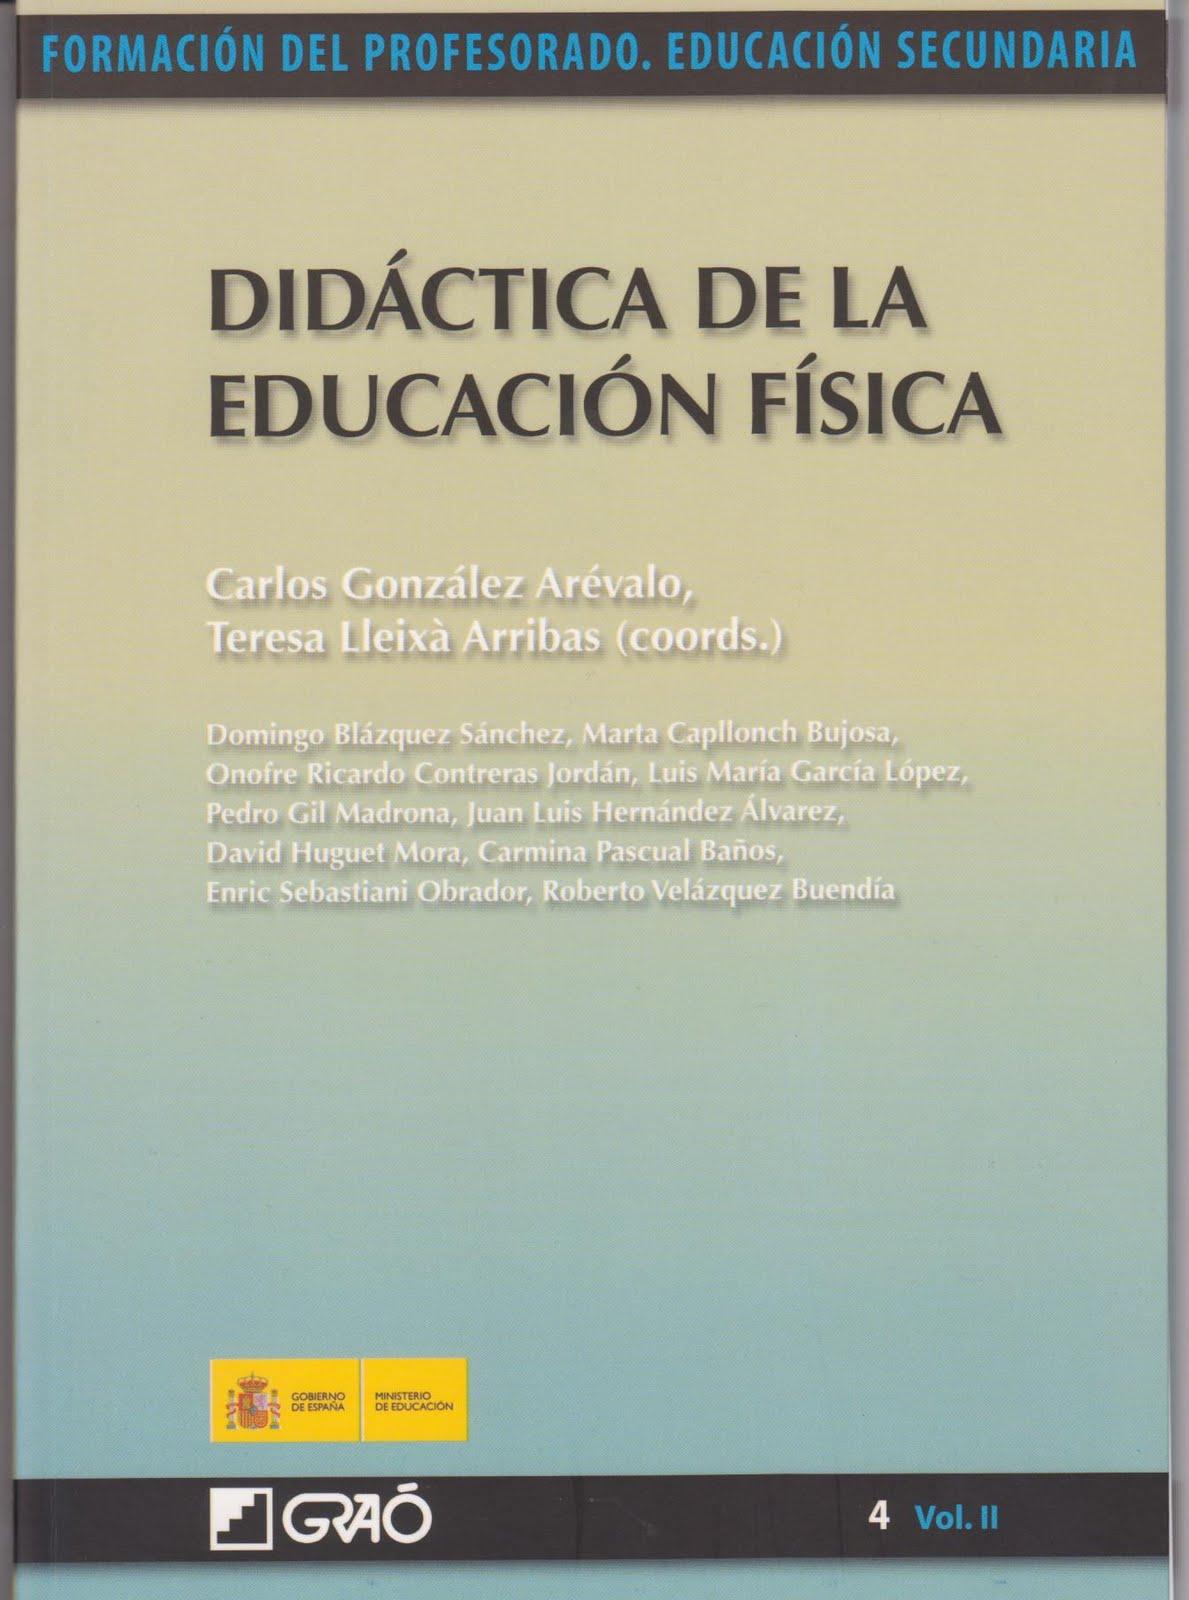 Educacion Fisica Secundaria Educaci n Secundaria